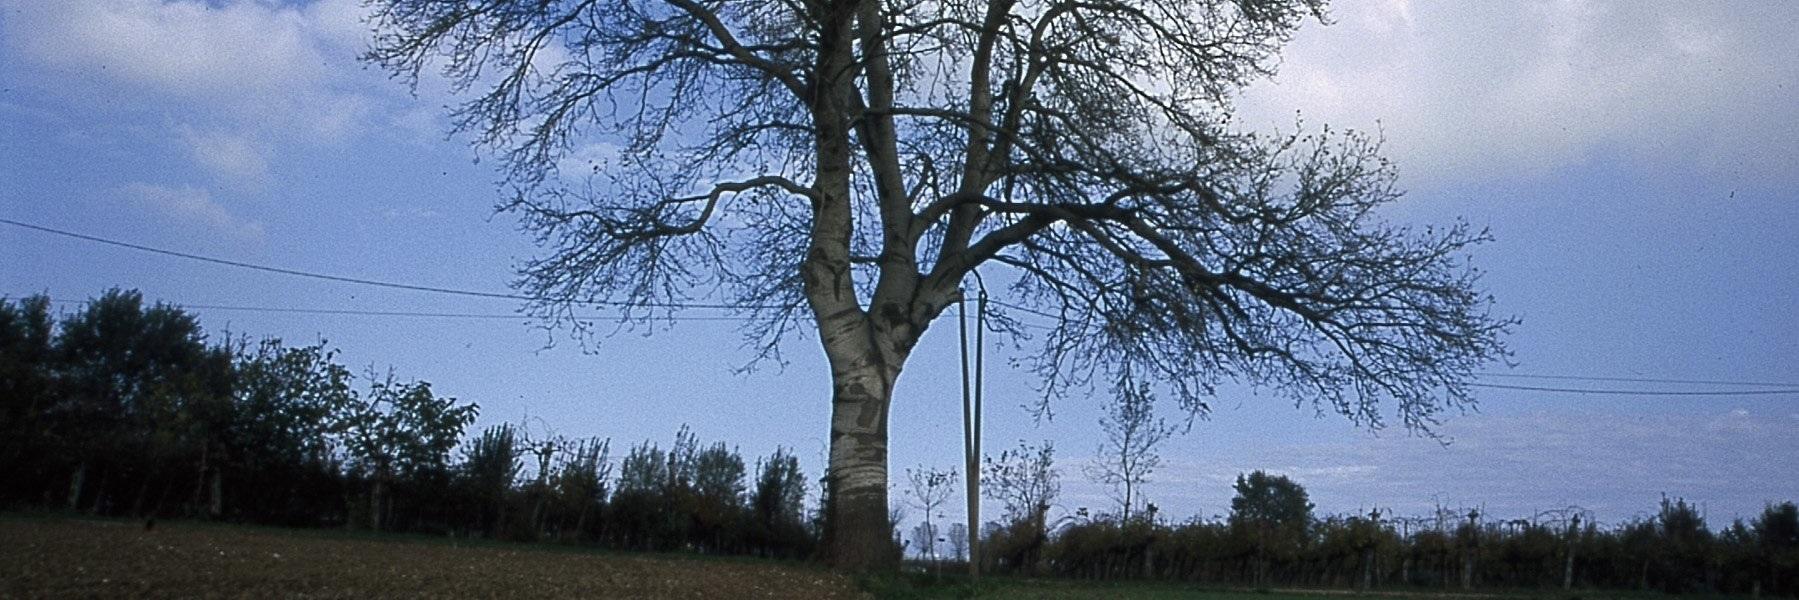 Monumental Tree: White Poplar - Populus Alba